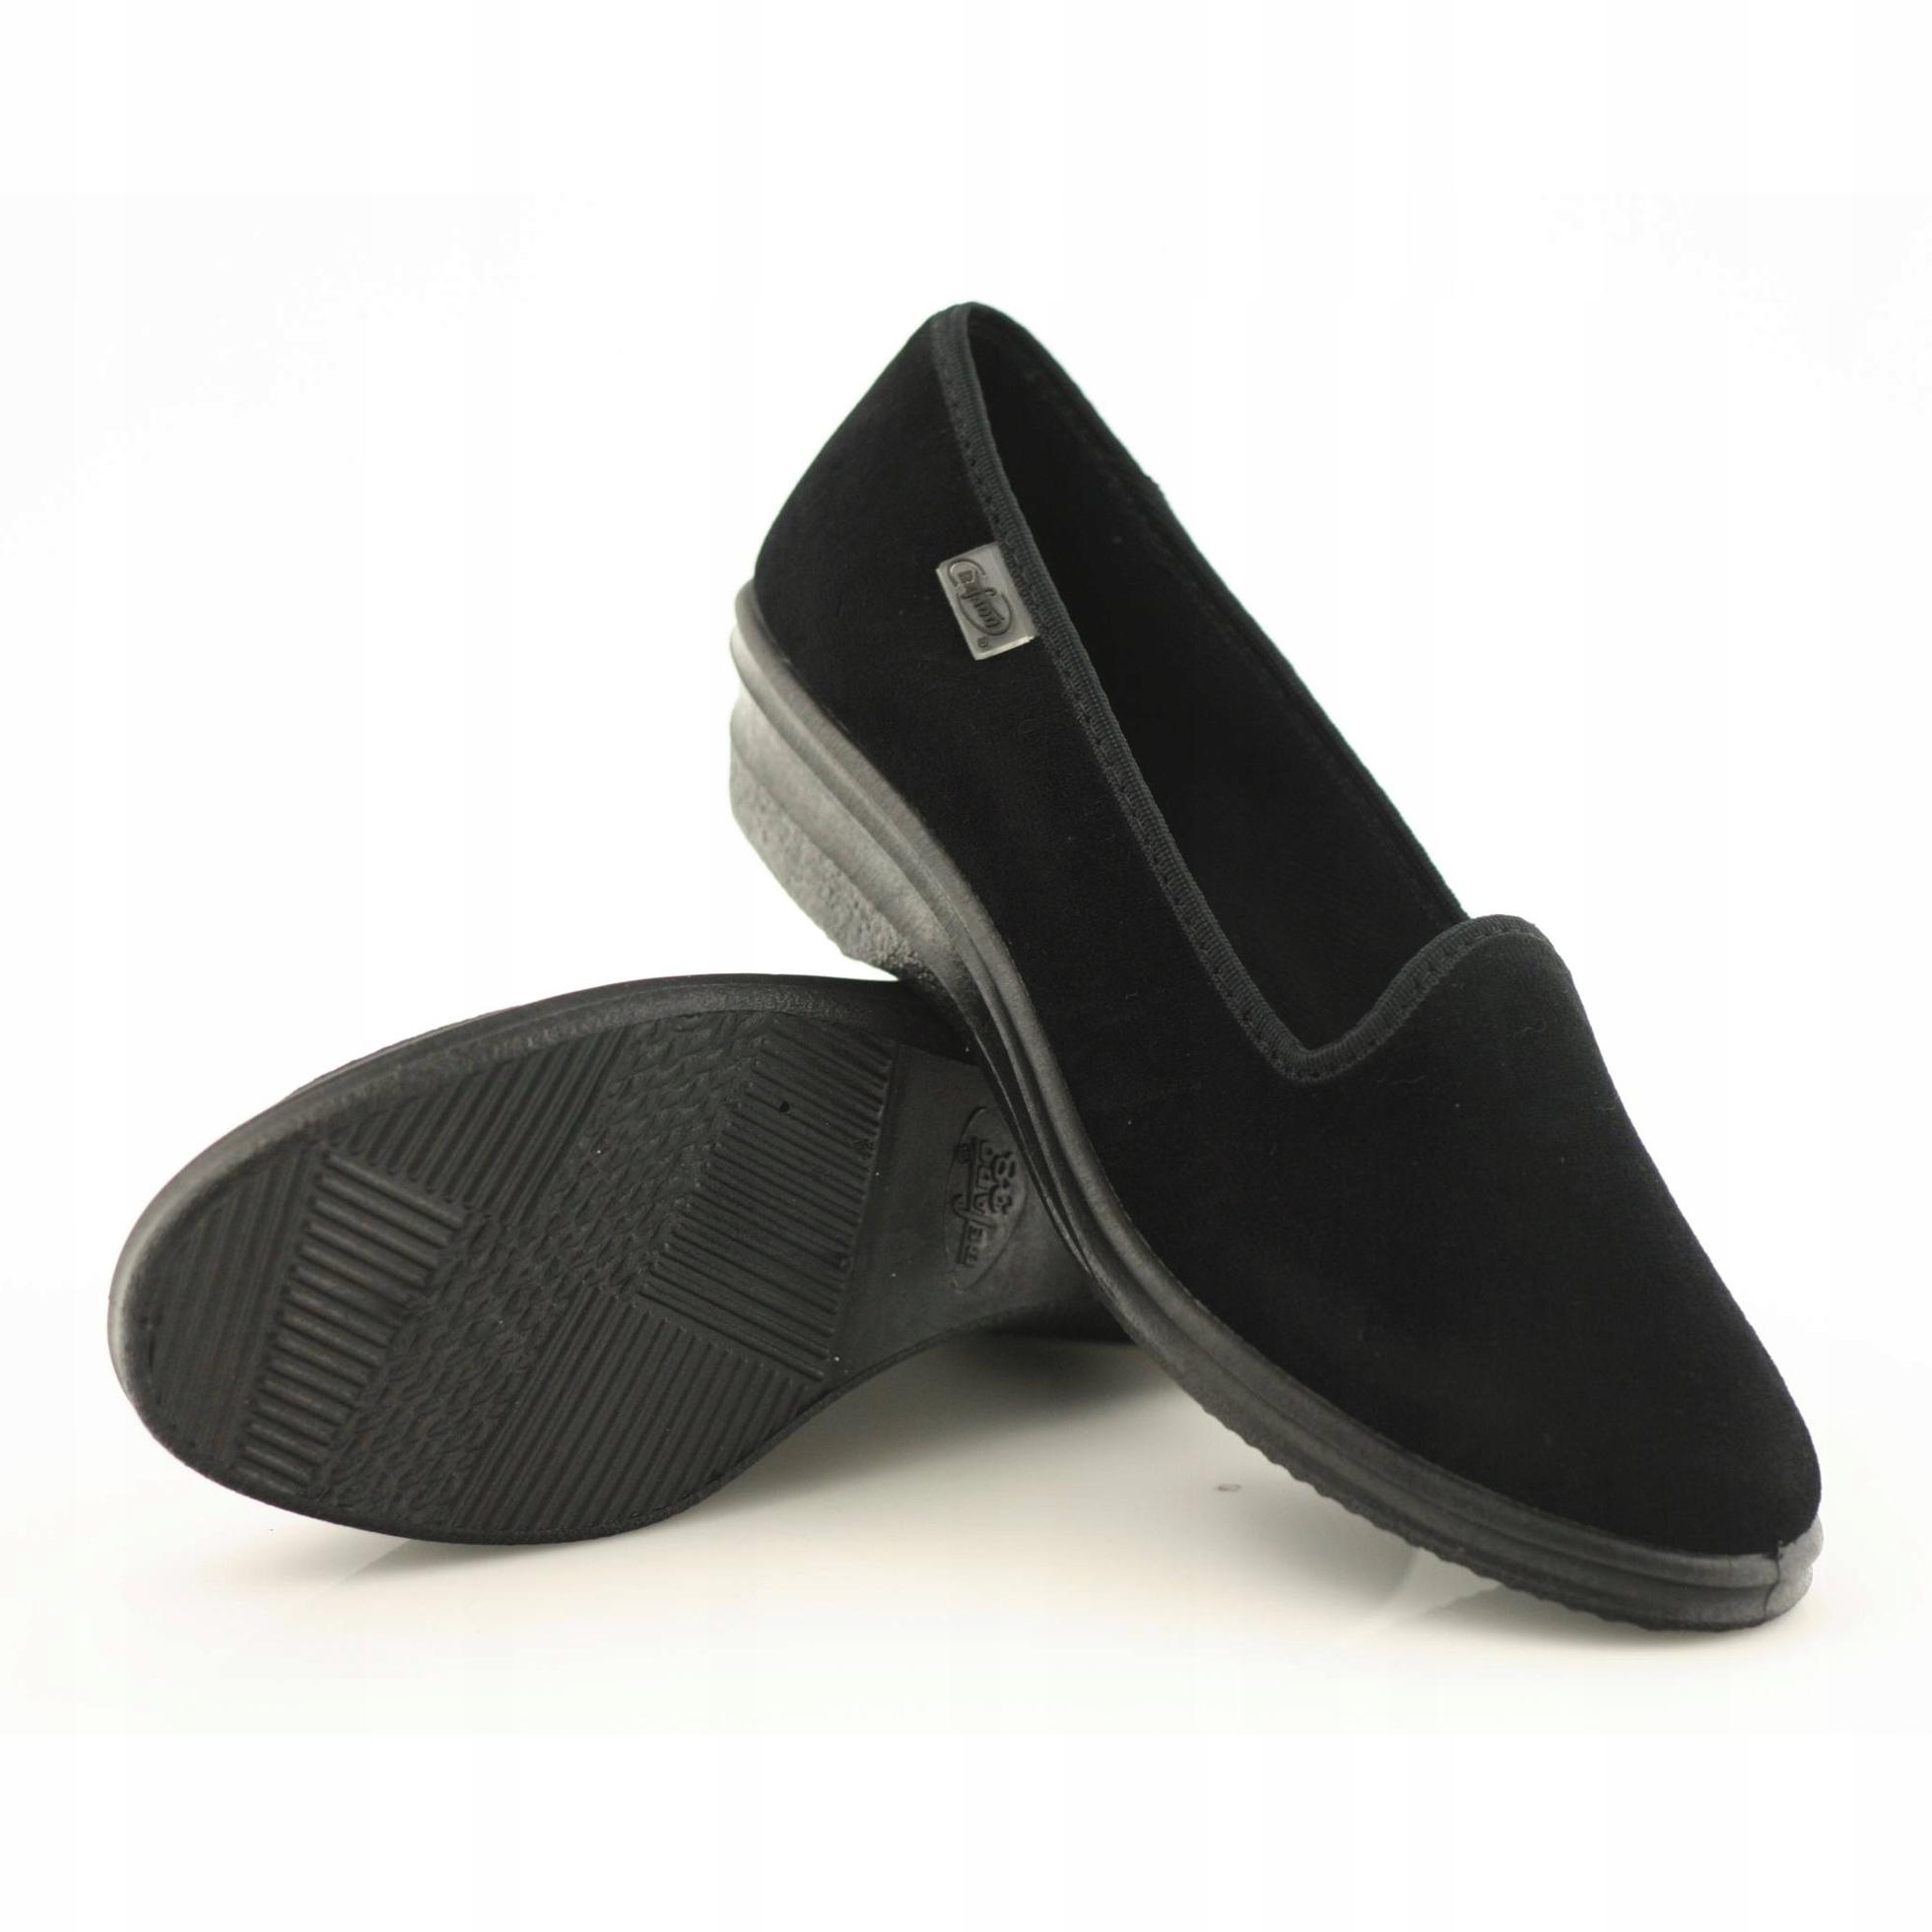 online store 6abbe 66bcb Befado 262D008 Keilabsatz Schuhe schwarz